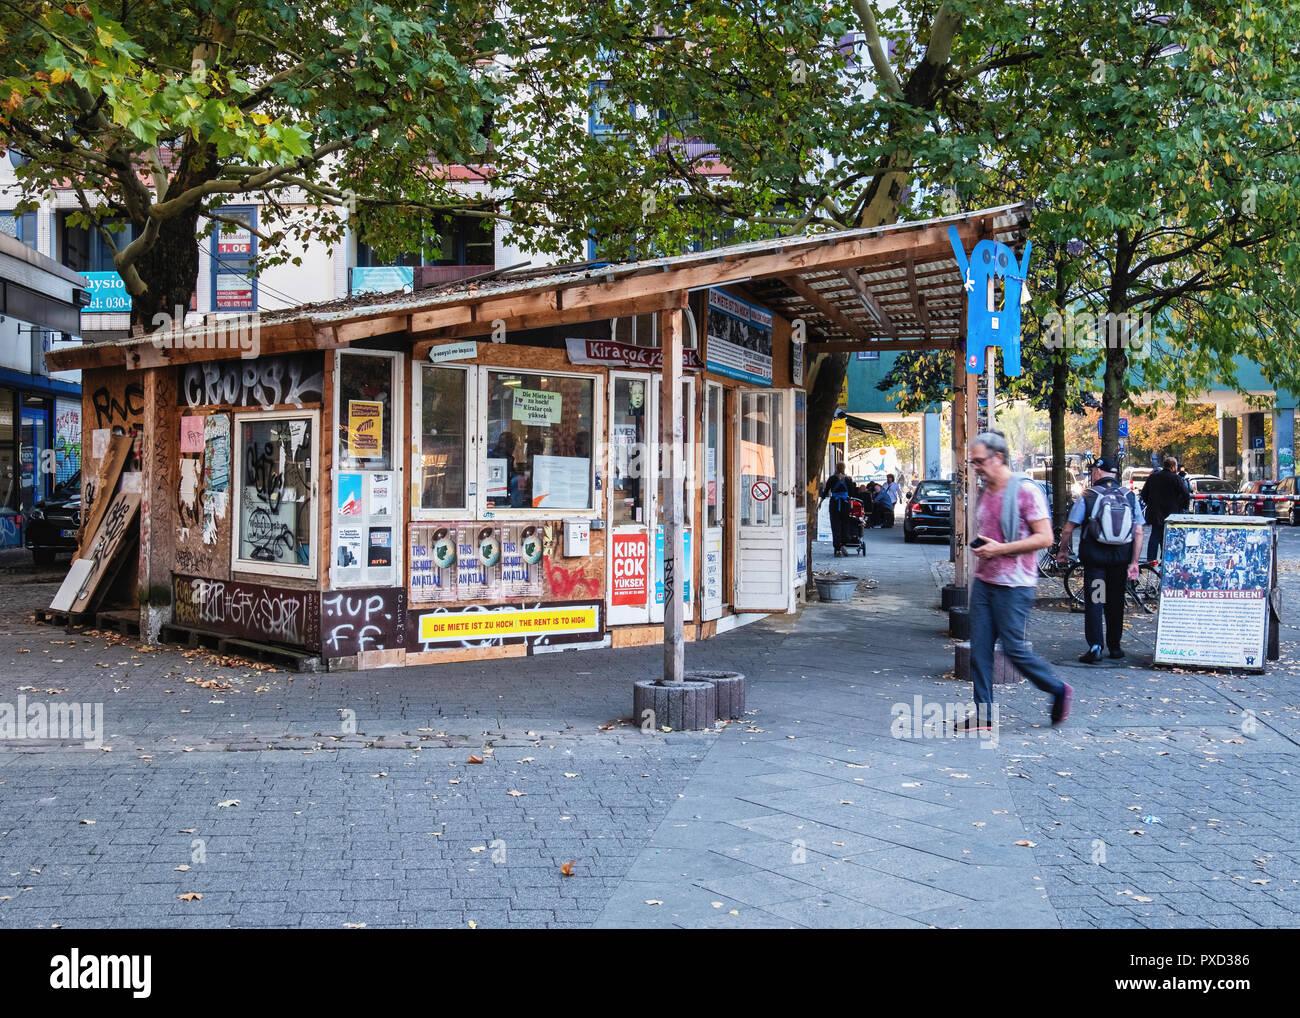 Gecekondu Wood pavilion houses Kotti & Co community project. A protest group representing locals & fighting high rents in Kreuzberg, Berlin. - Stock Image